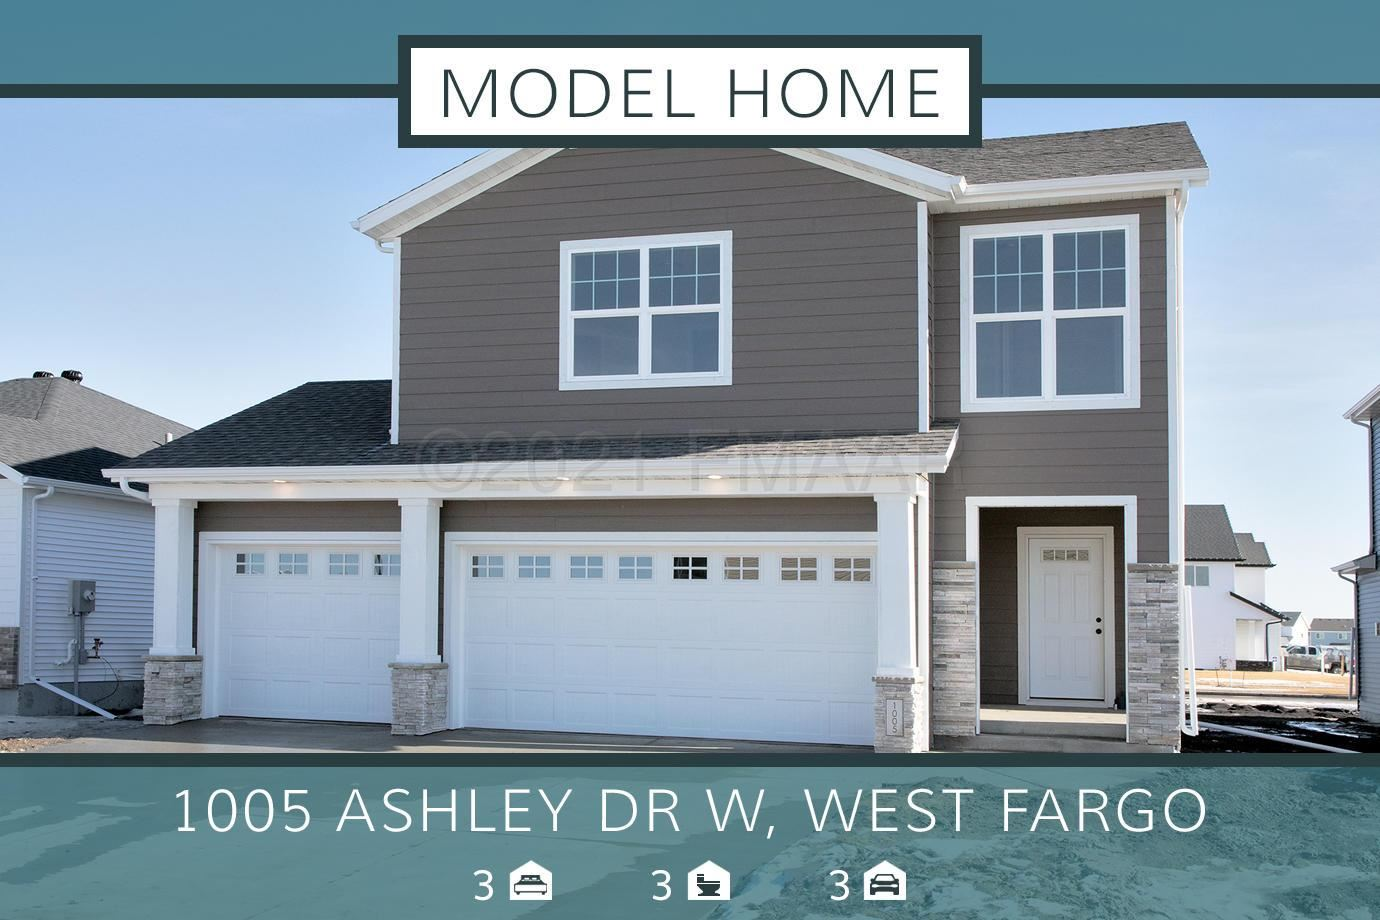 1005 ASHLEY Drive W, West Fargo, ND 58078 - #: 21-746